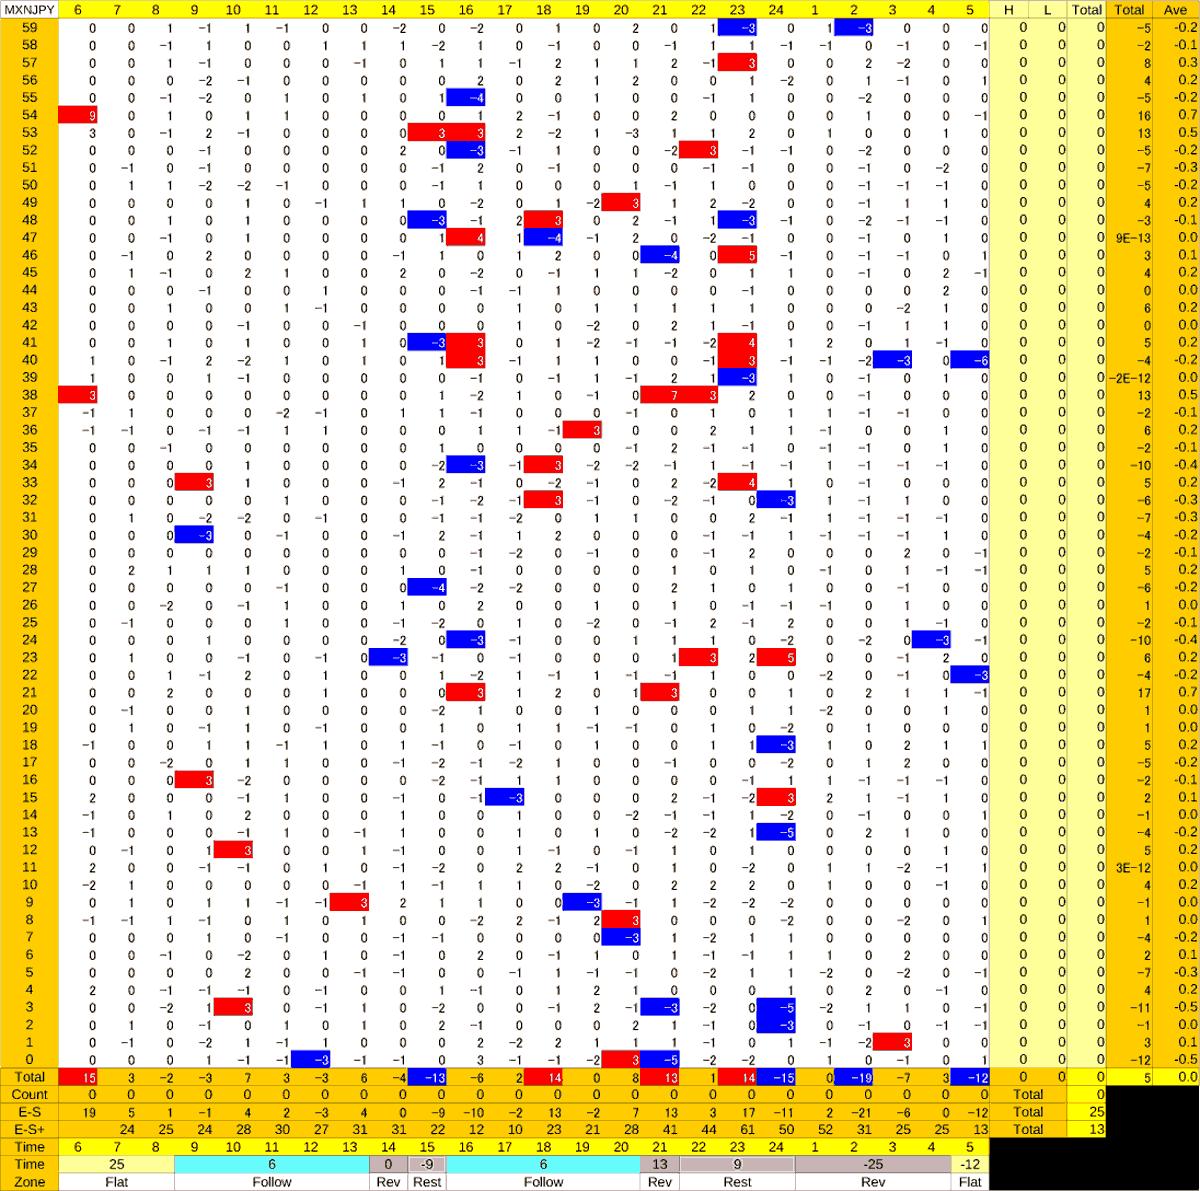 20200722_HS(3)MXNJPY